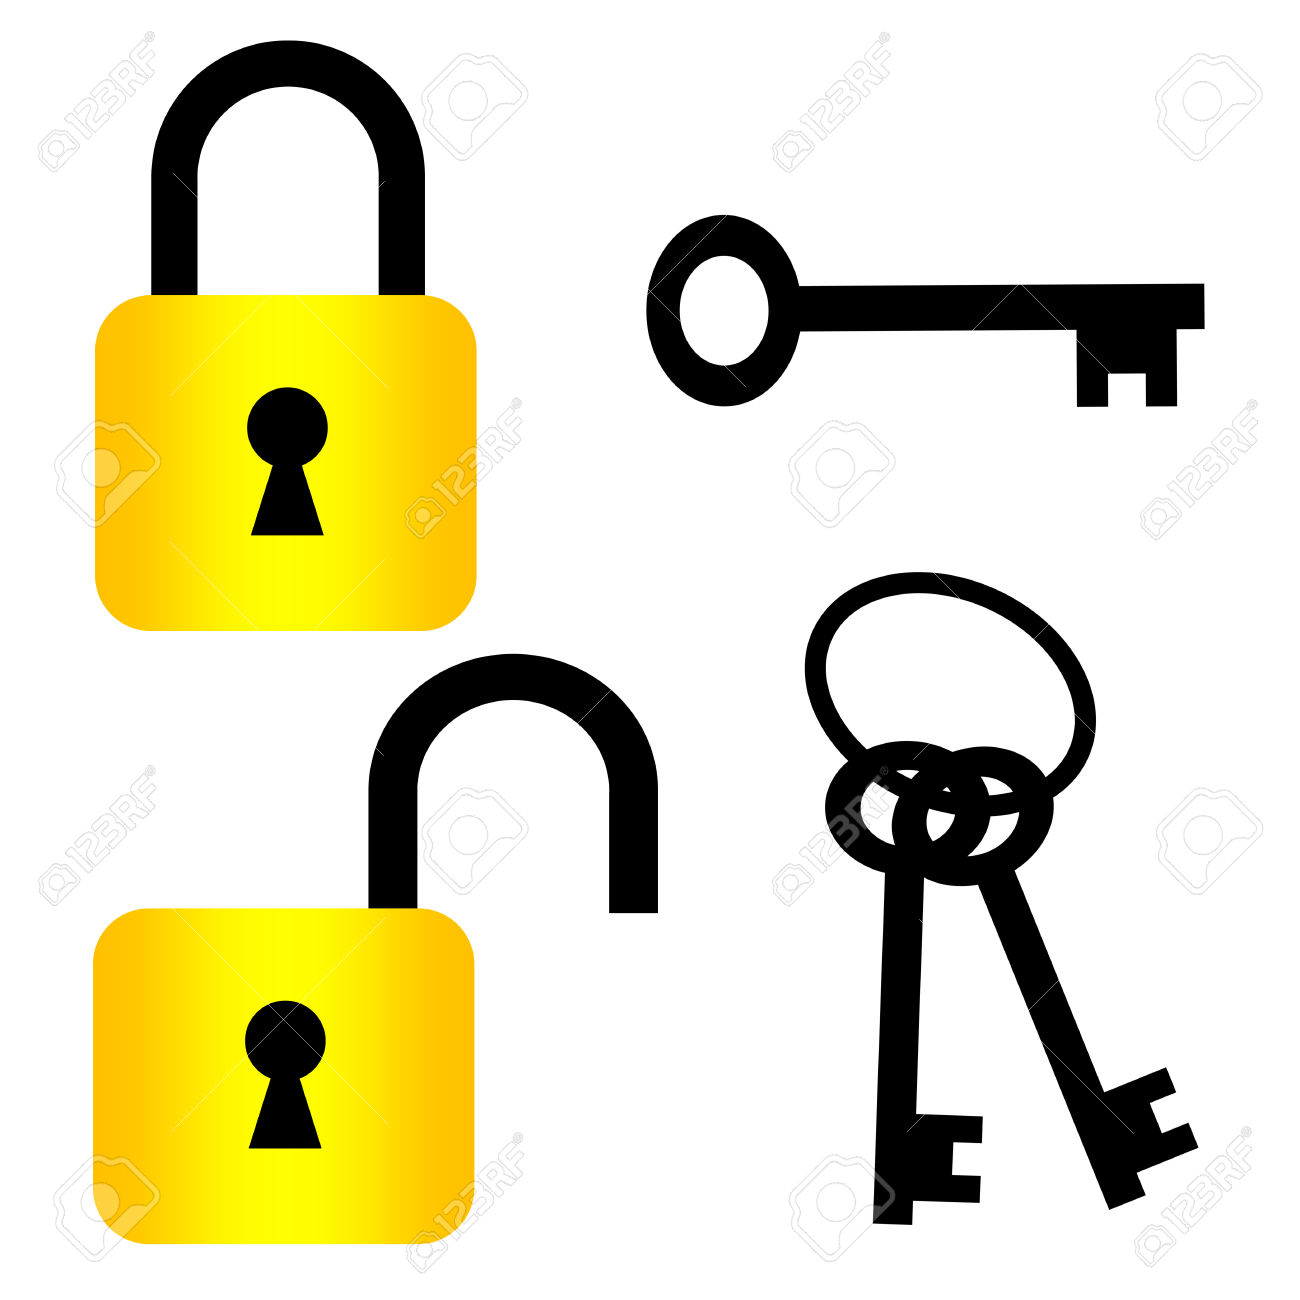 padlock and key clipart - photo #7